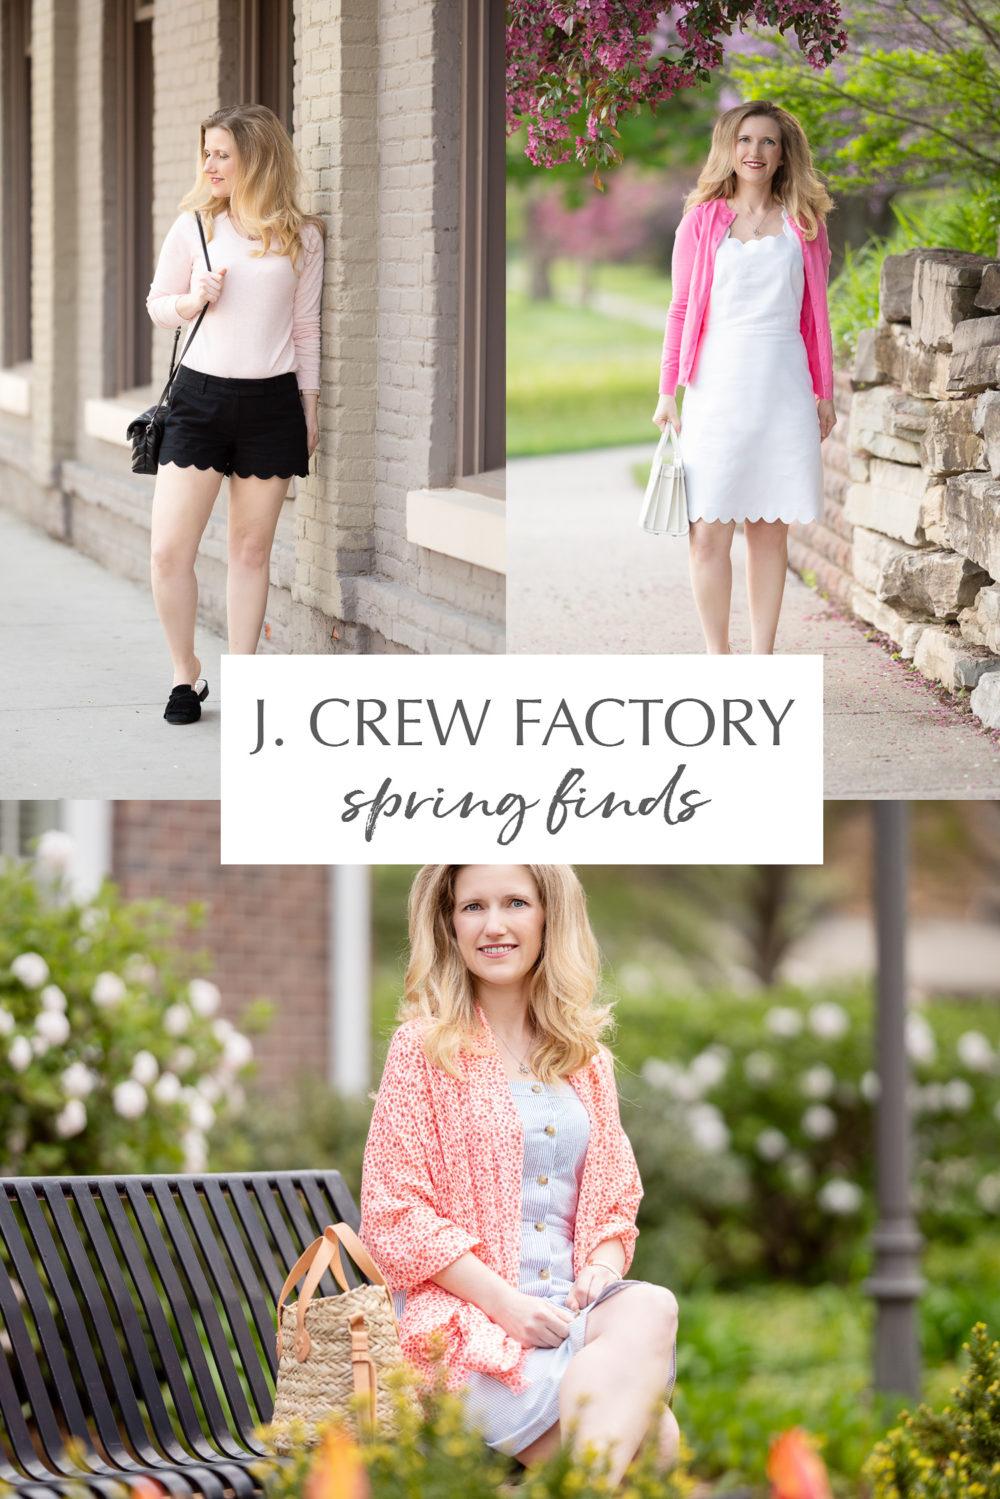 Petite Fashion Blog | J. Crew Factory Dresses | J. Crew Factory Spring Arrivals